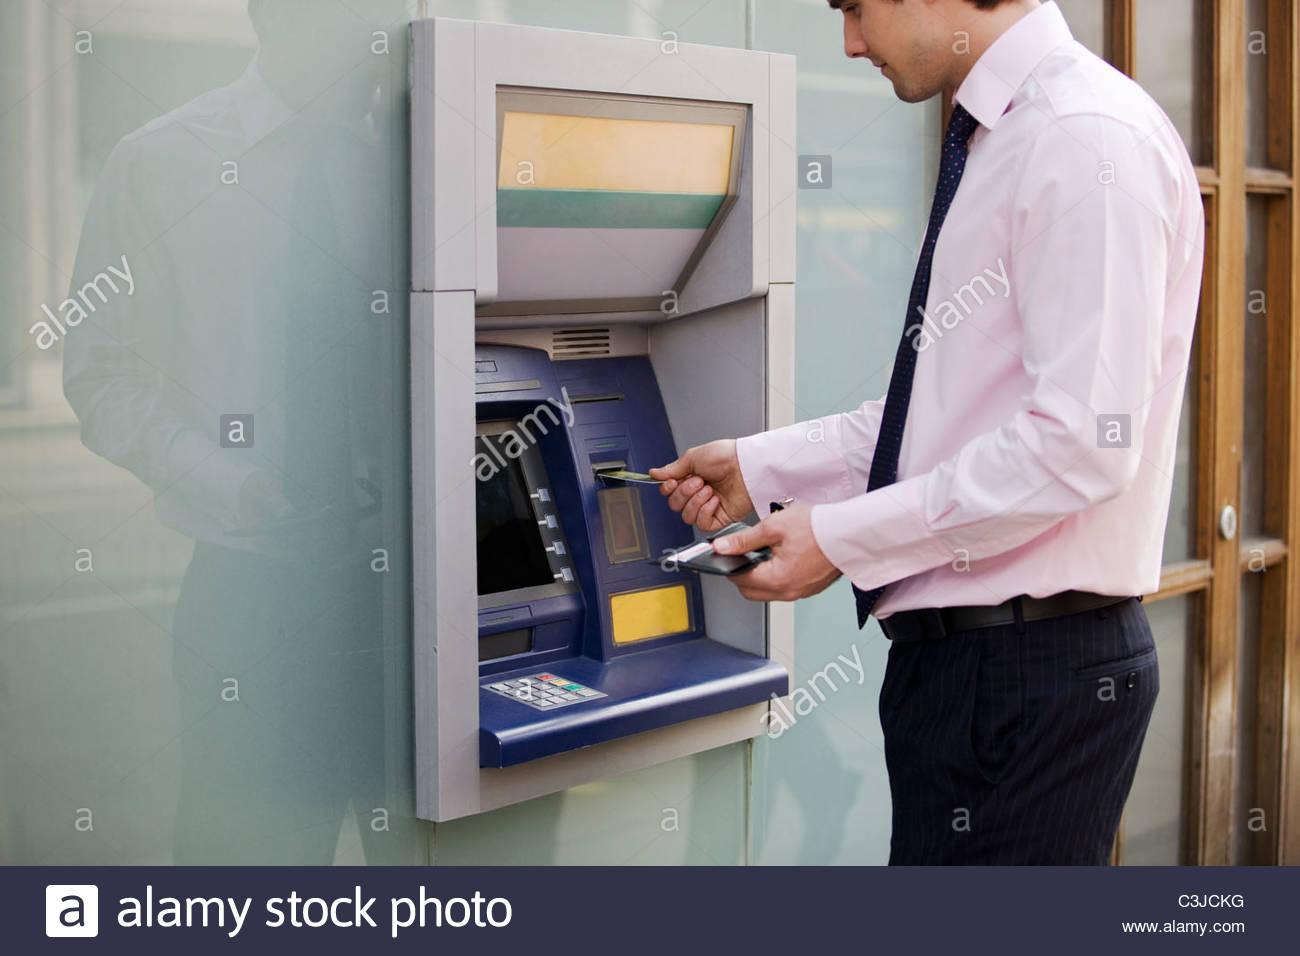 A businessman using a cash machine - Stock Image